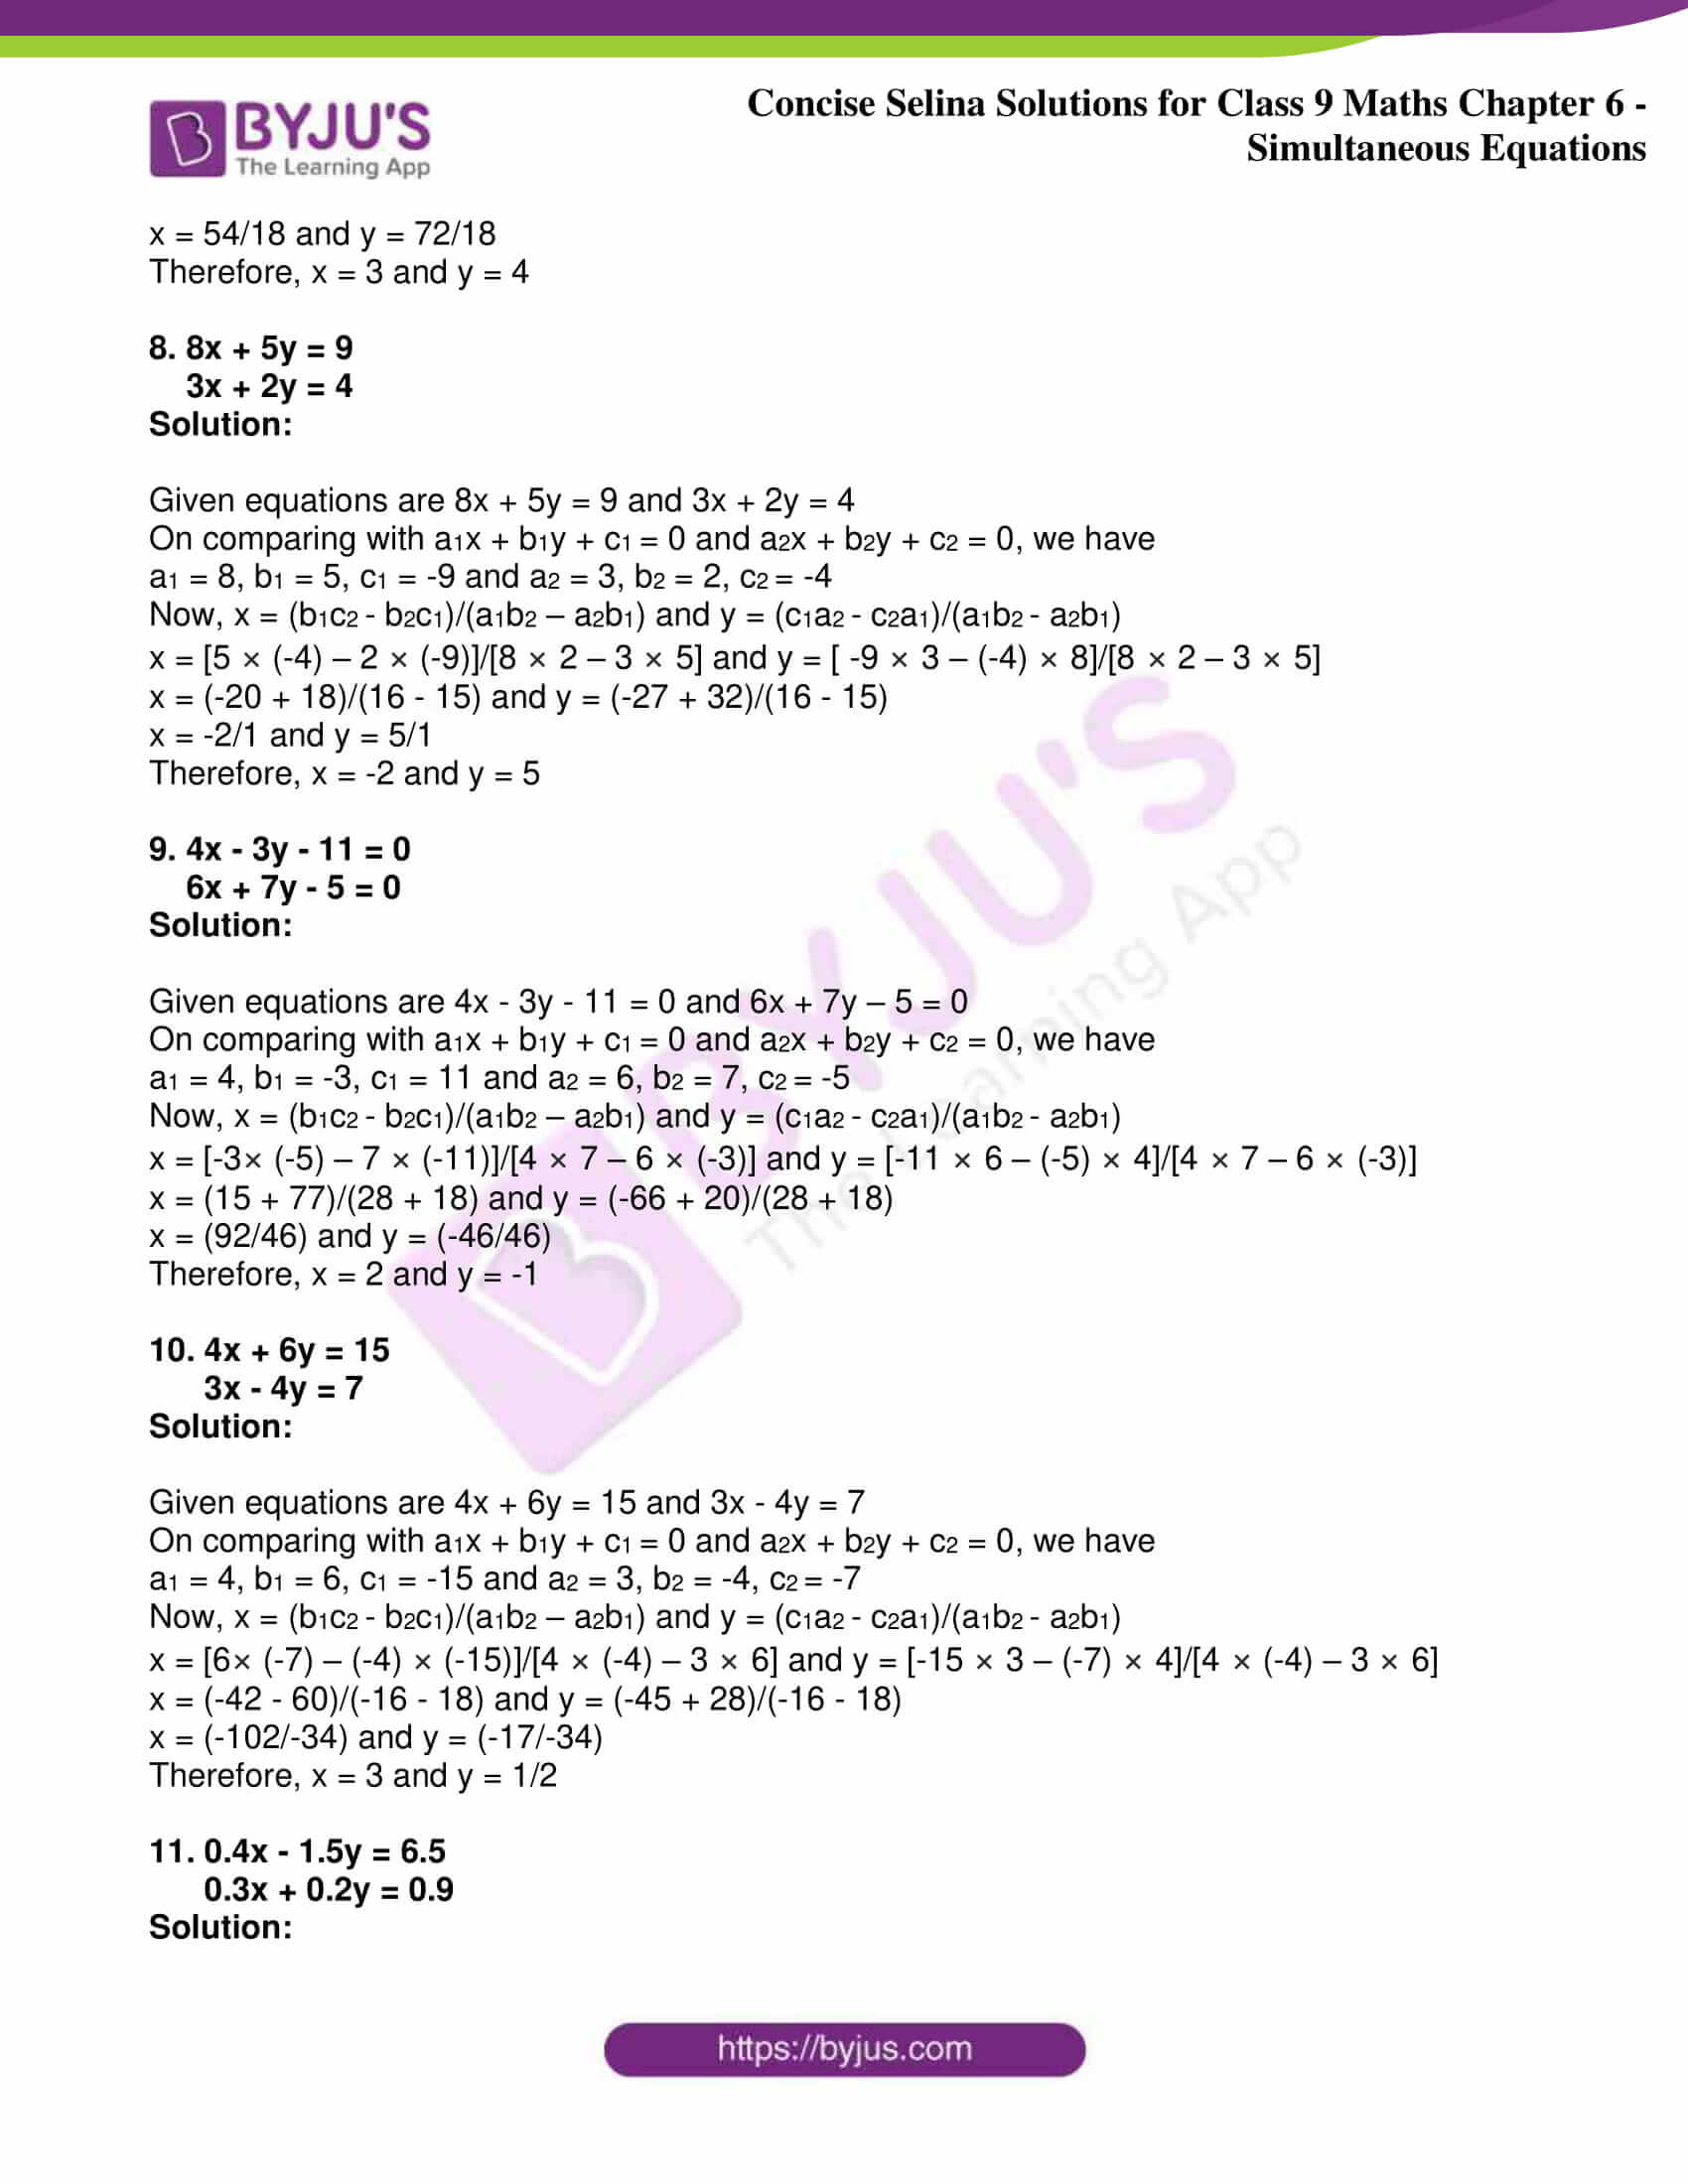 icse class 9 jun7 maths selina solutions chapter 6 simultaneous equations 22